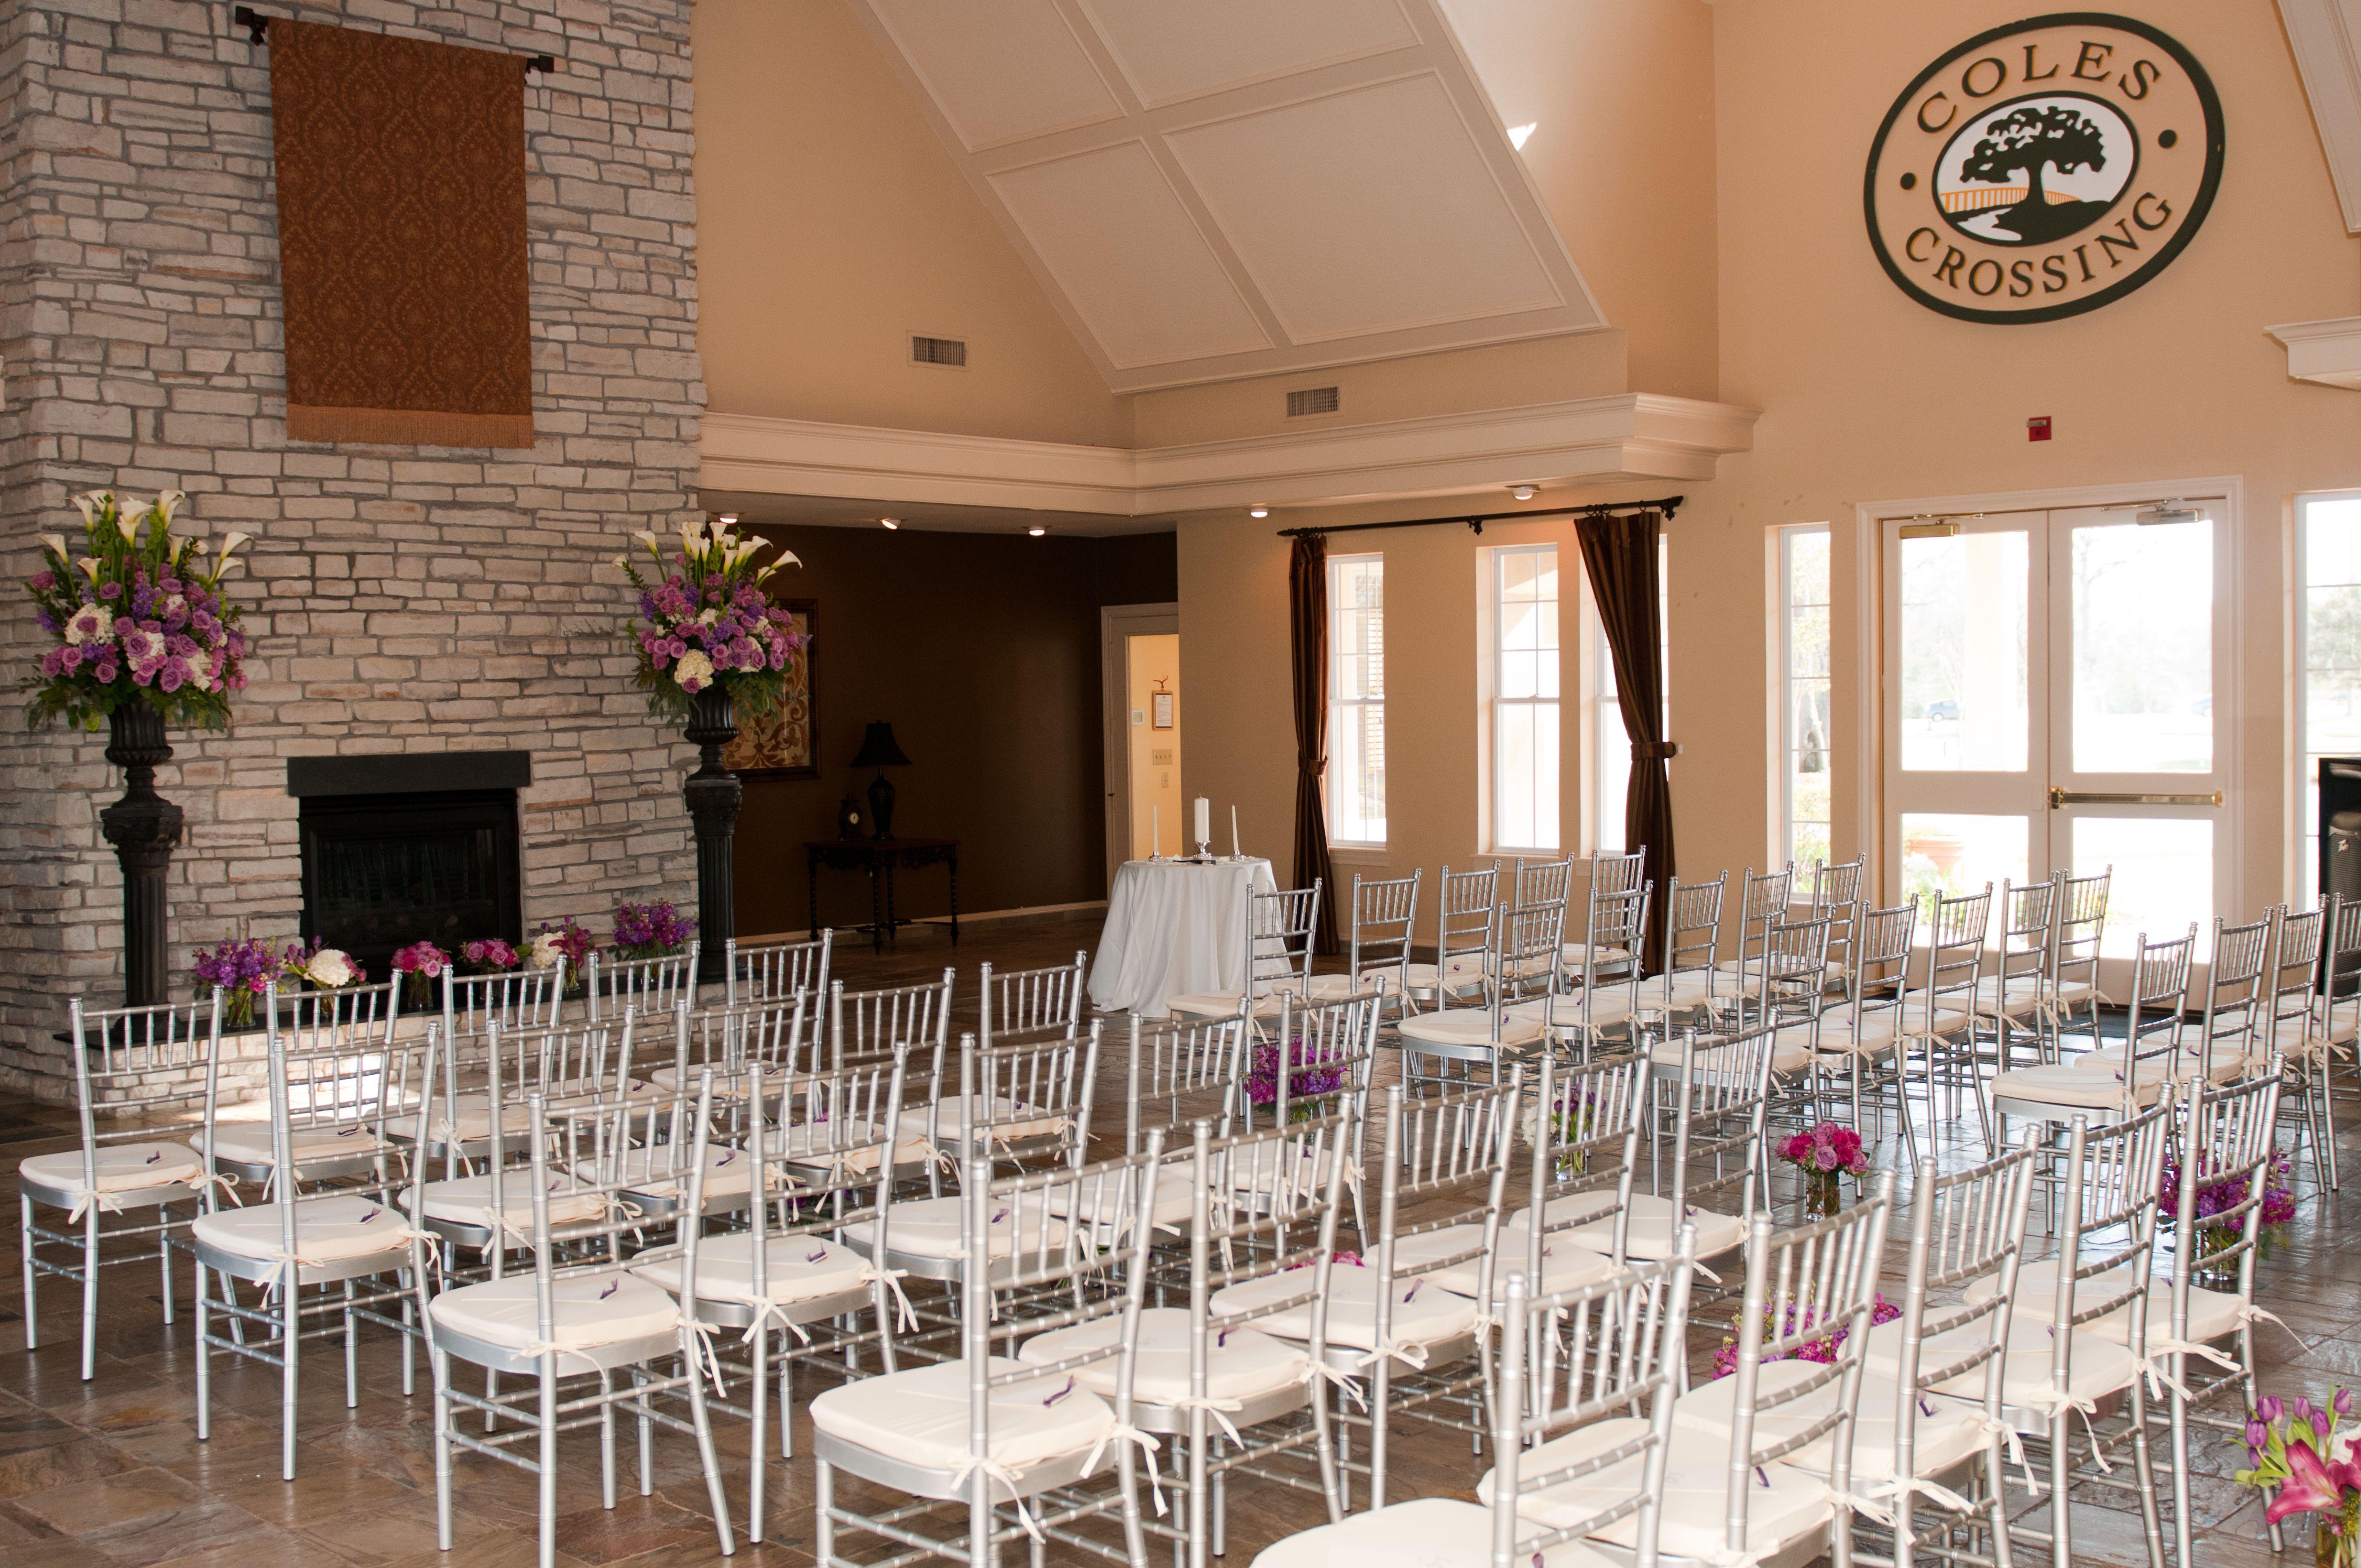 Coles Crossing Clubhouse In Northwest Houston Ceremony Set Up Wedding Venue Houston Club House Wedding Venues